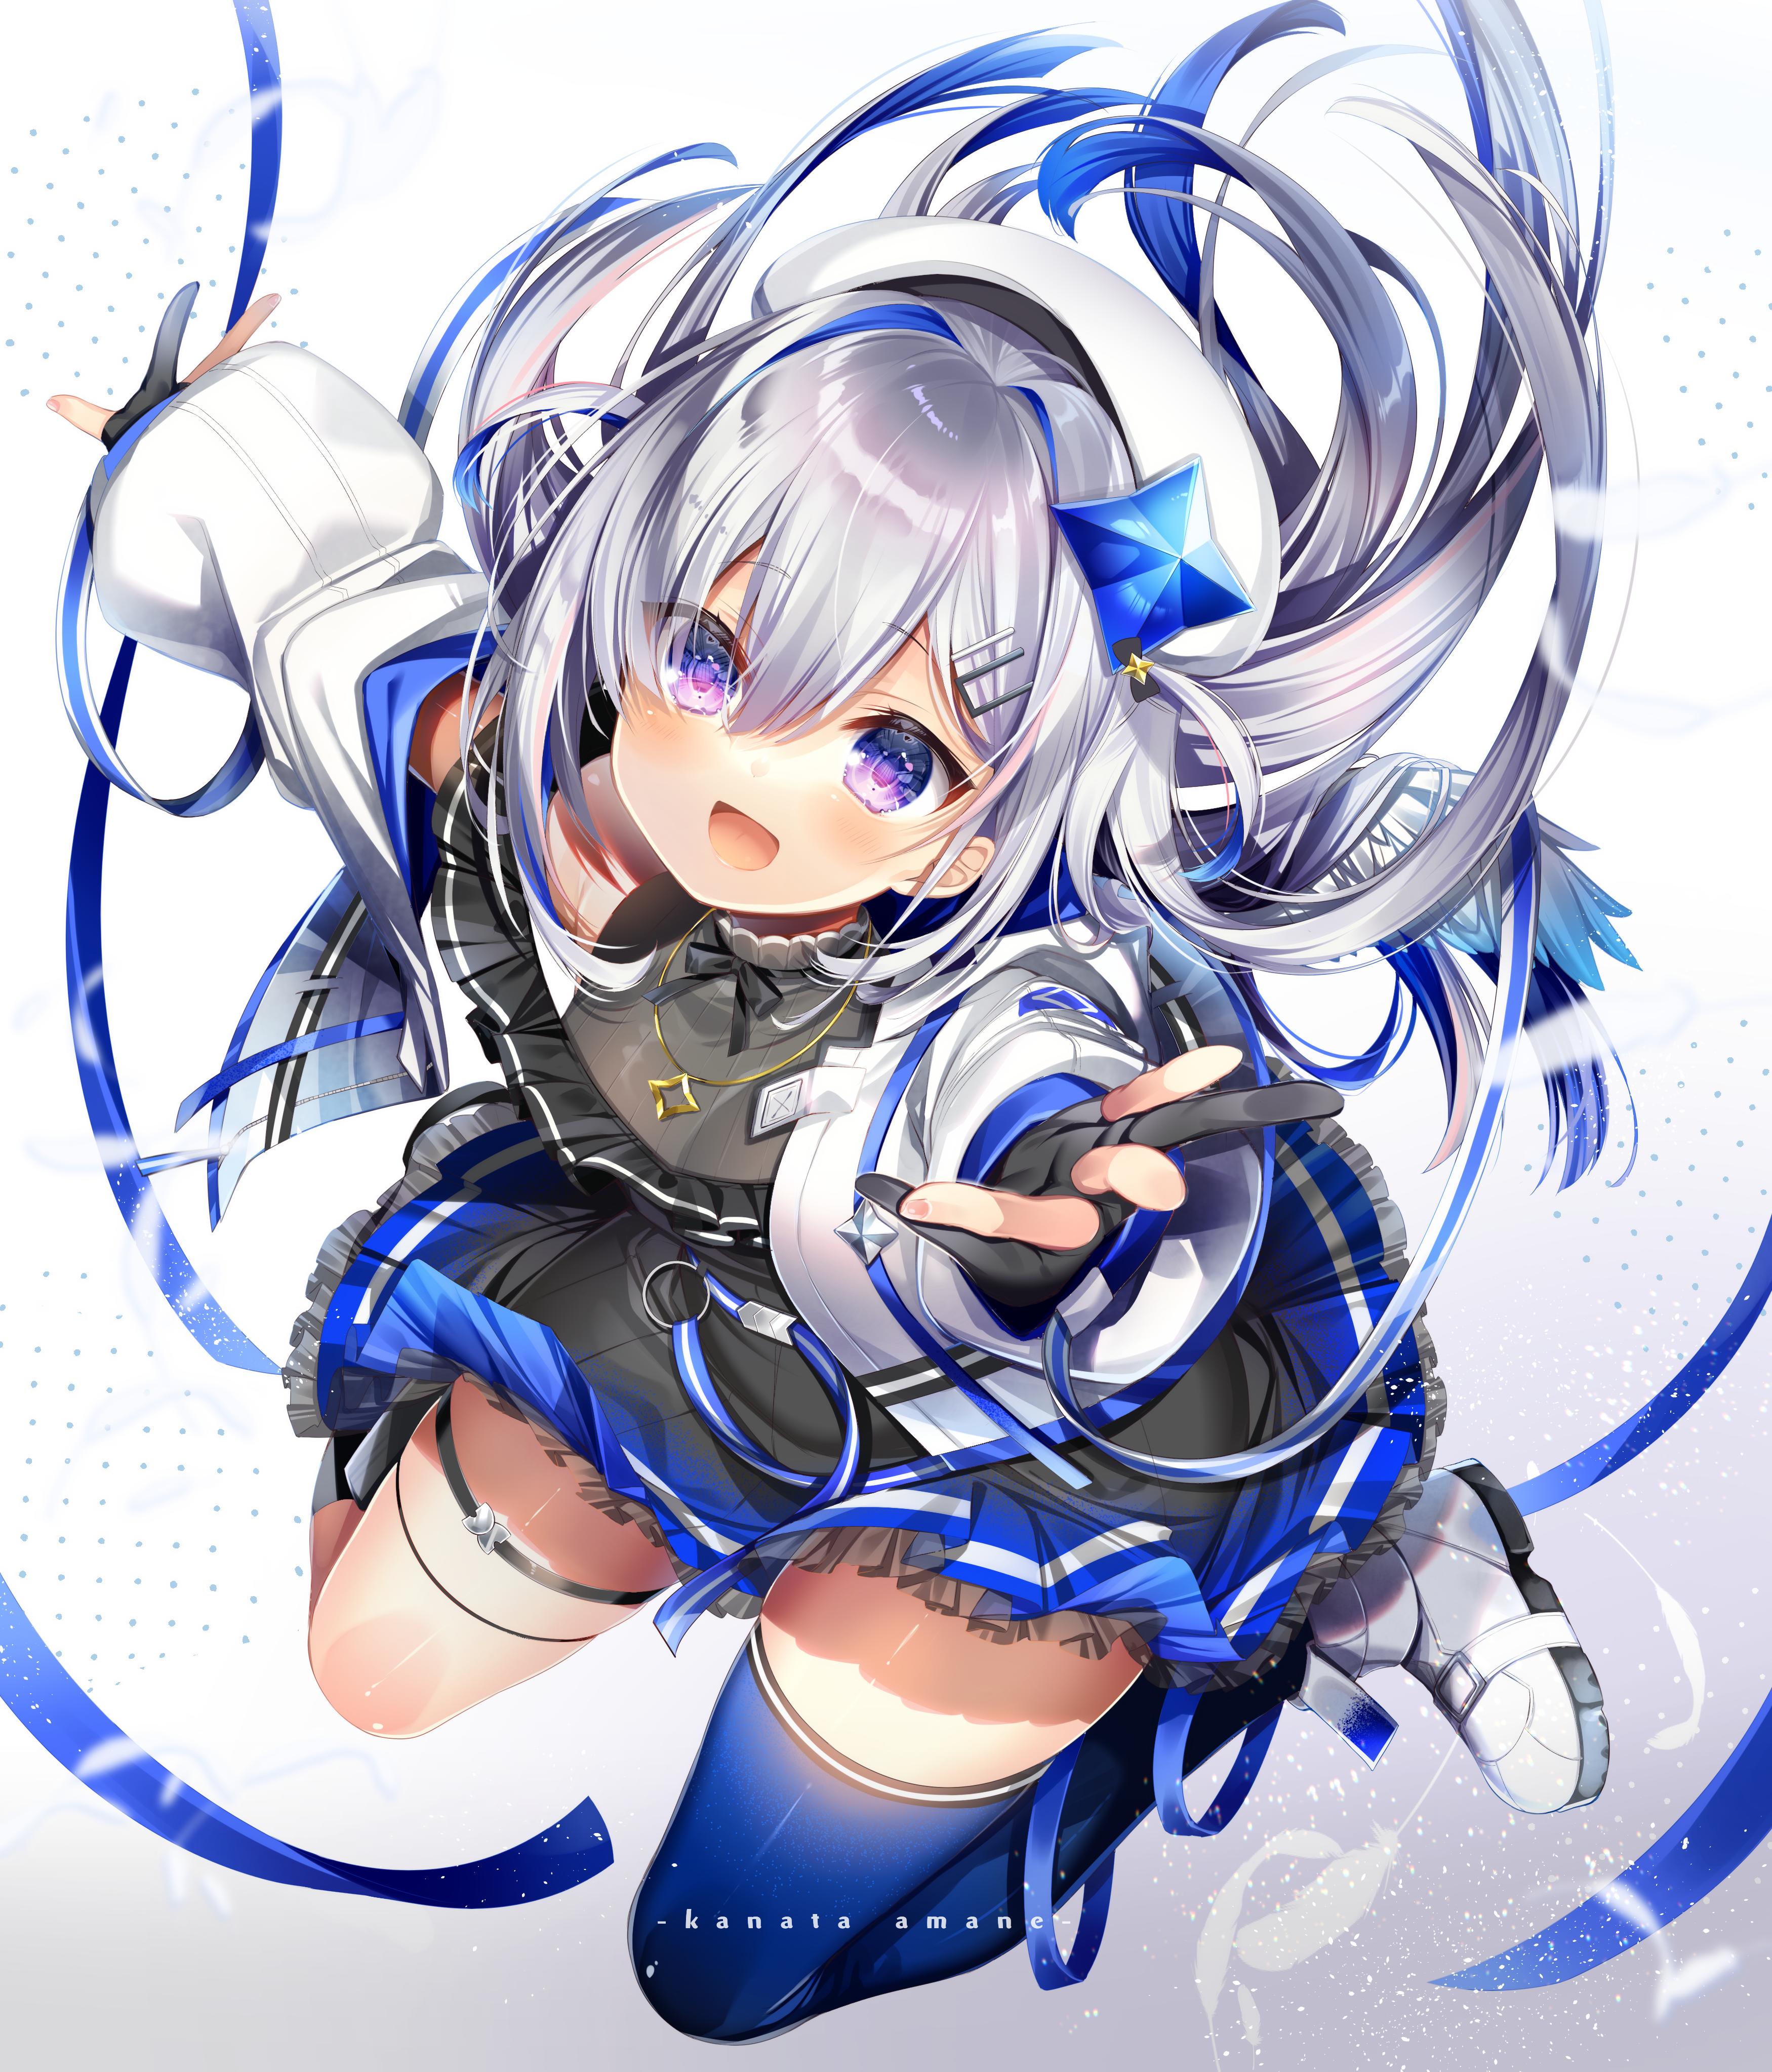 Anime 3500x4092 thigh-highs ribbon Hololive Virtual Youtuber Amane Kanata anime girls silver hair purple eyes